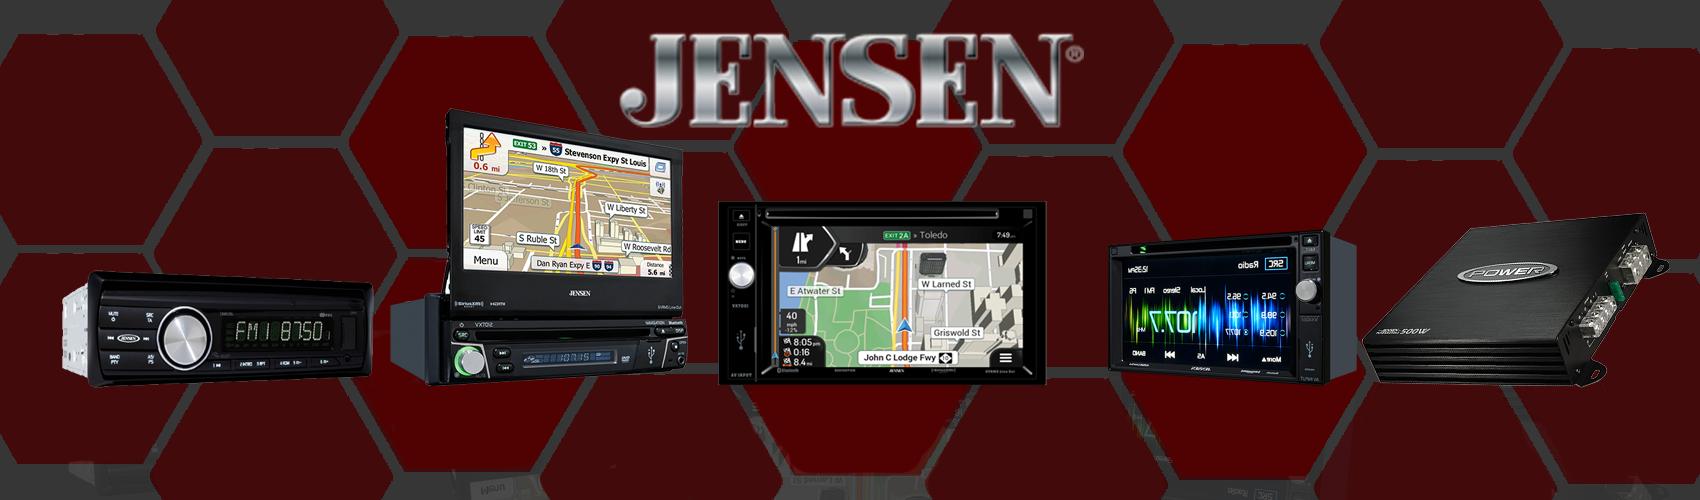 Jensen_GenericBanner_WithoutCurrentModels